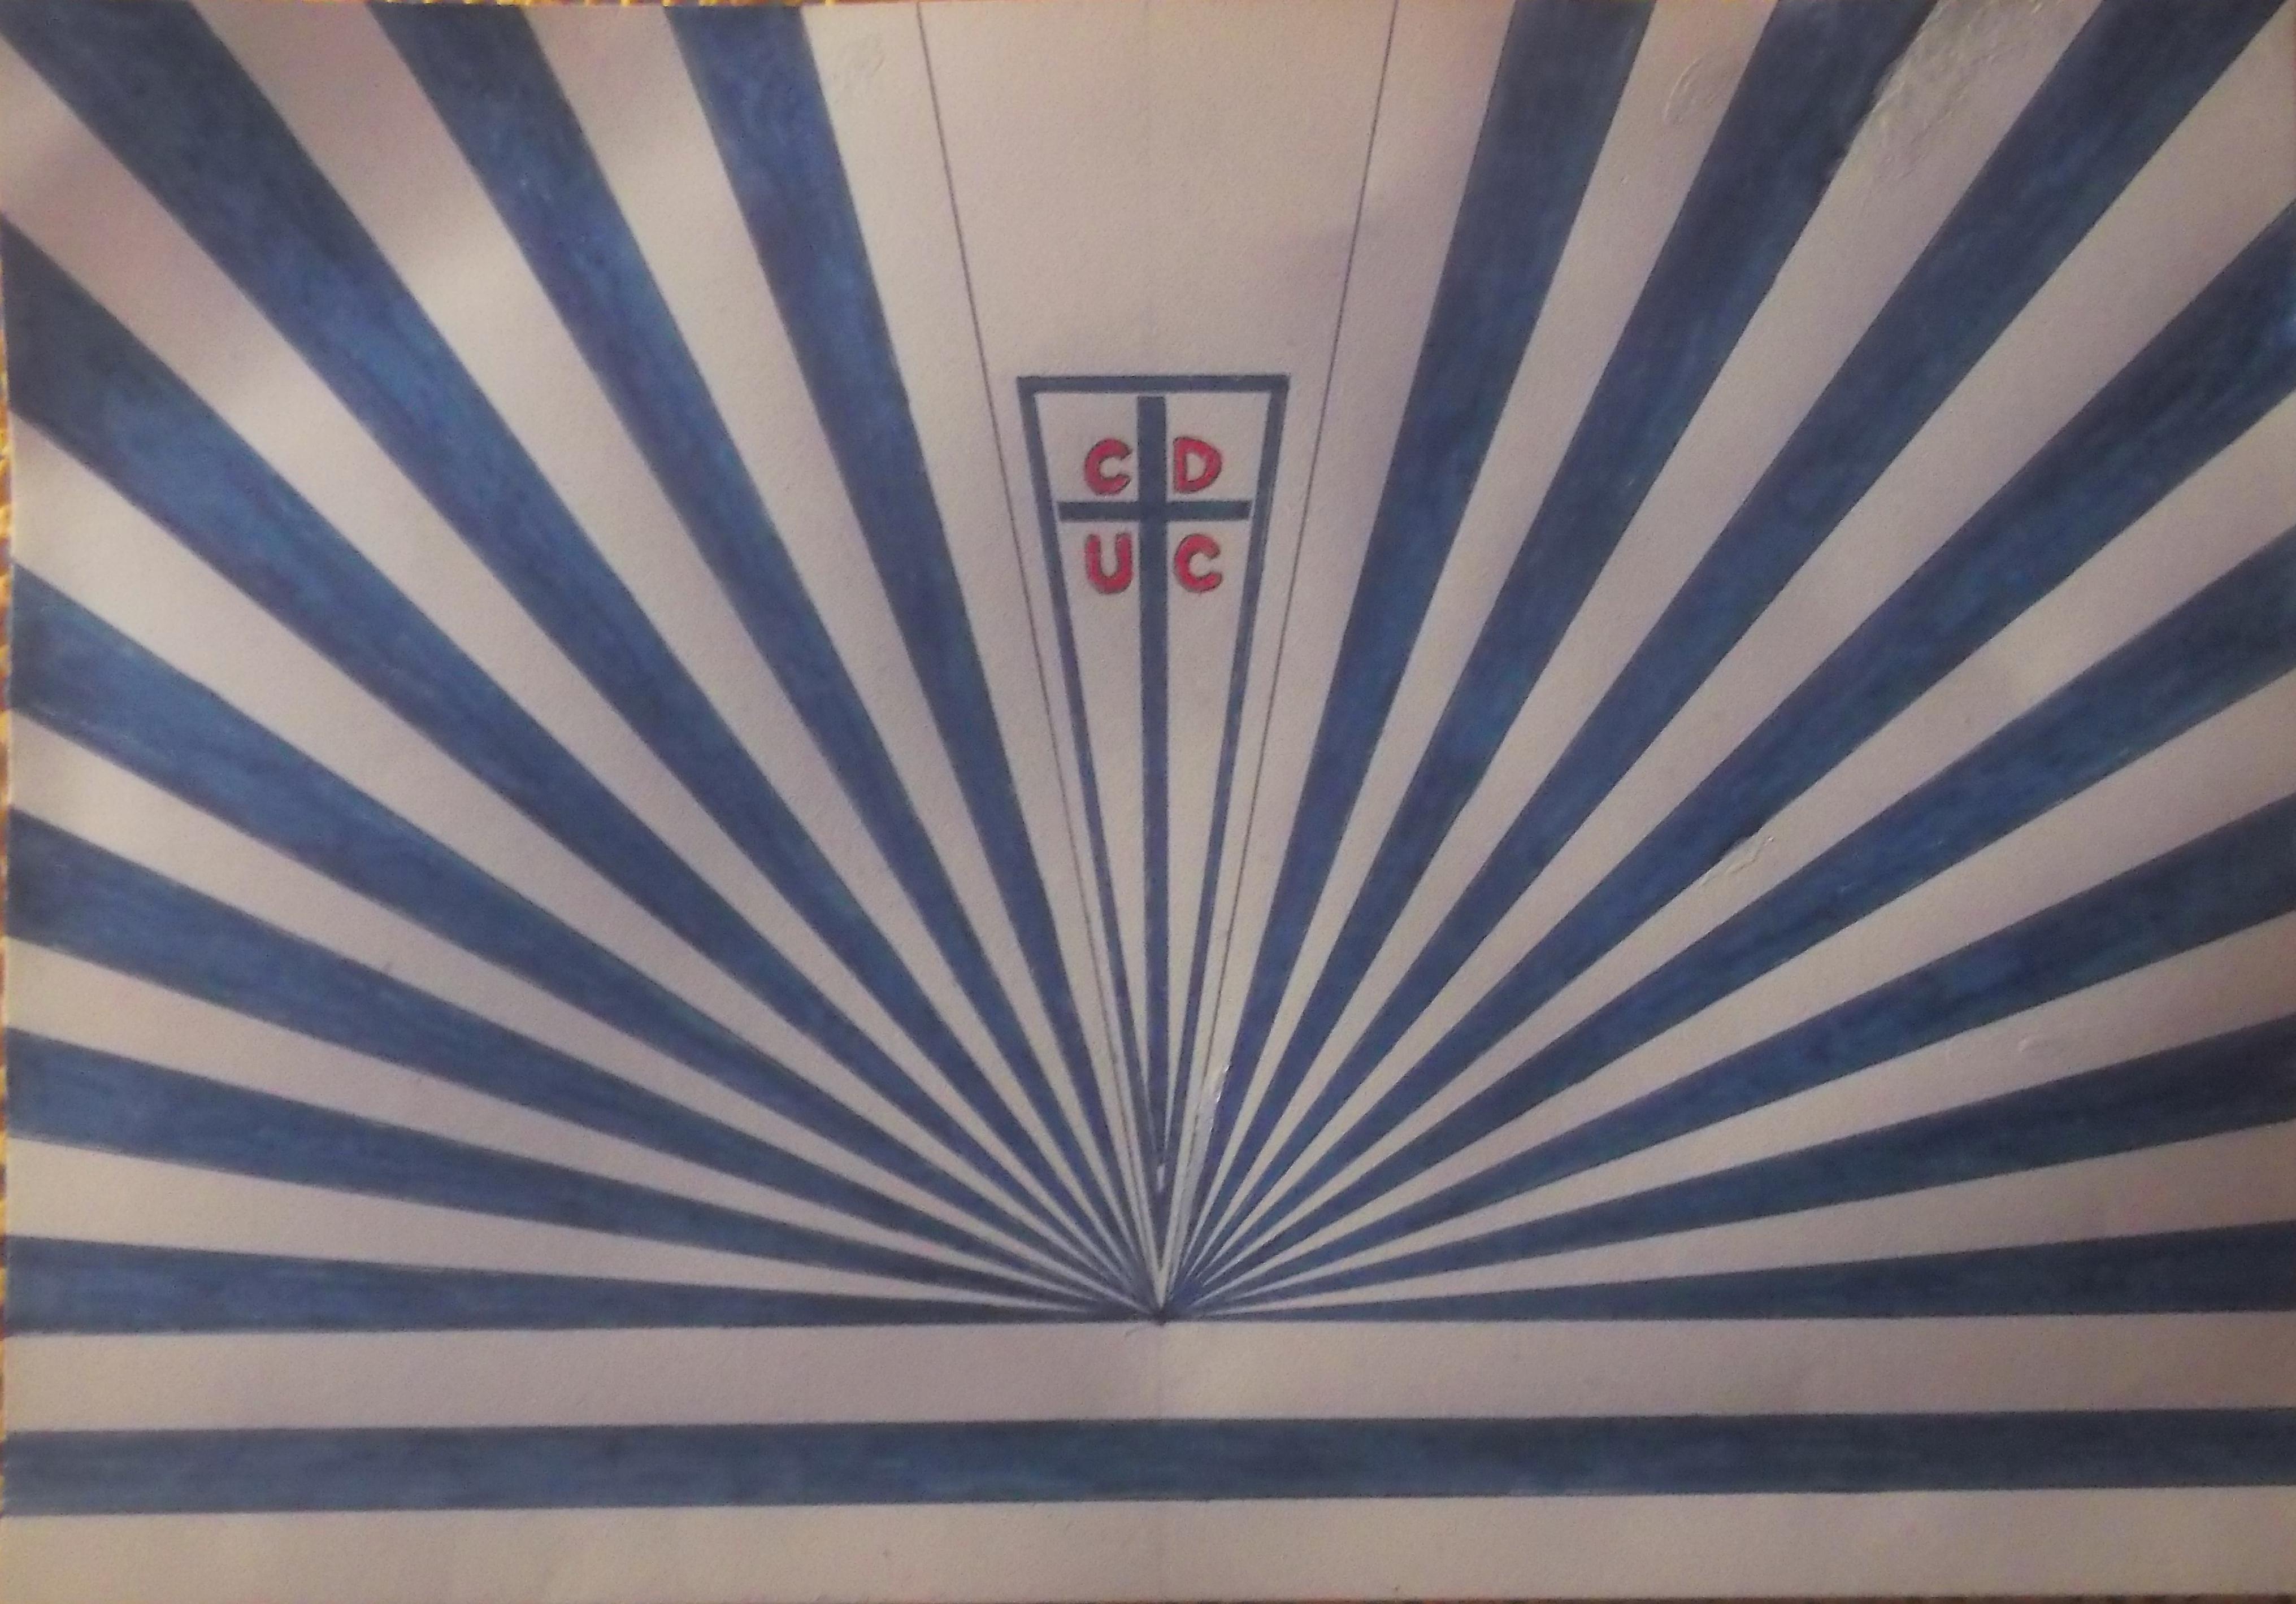 Escudo del Universidad Católica de Chile.